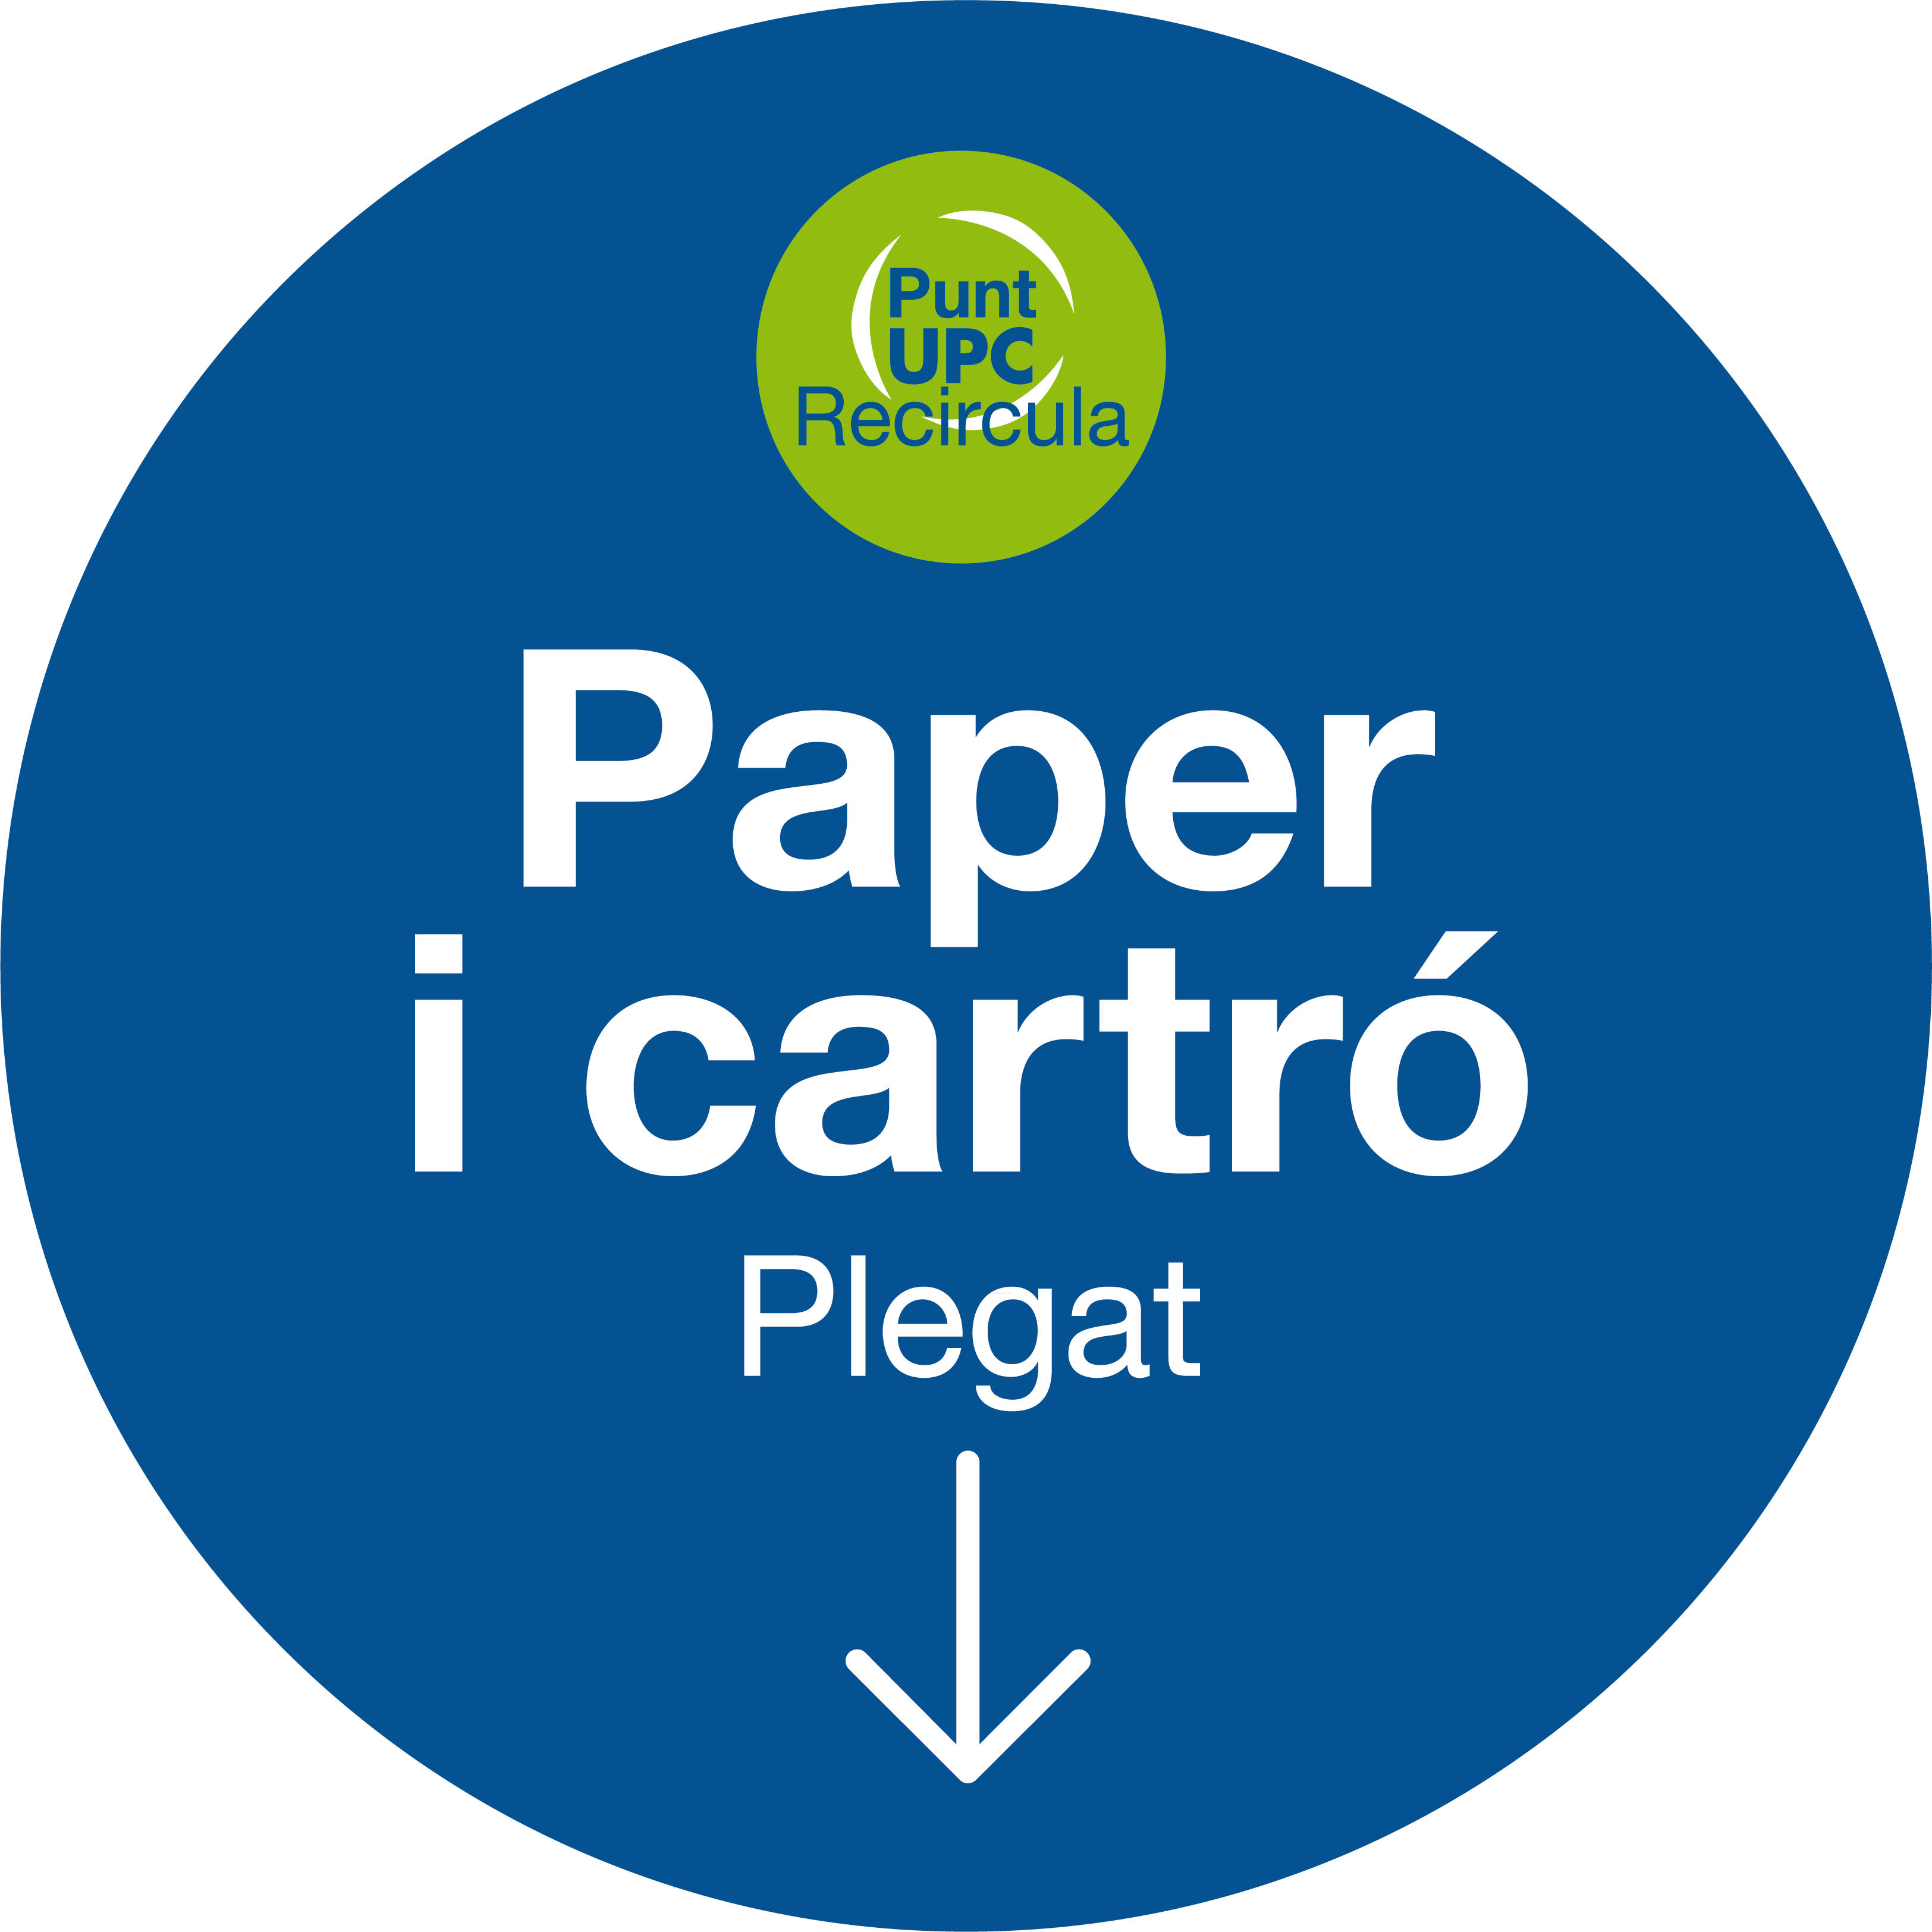 punt-upc-recircula_imatge_punt_cartro.jpg